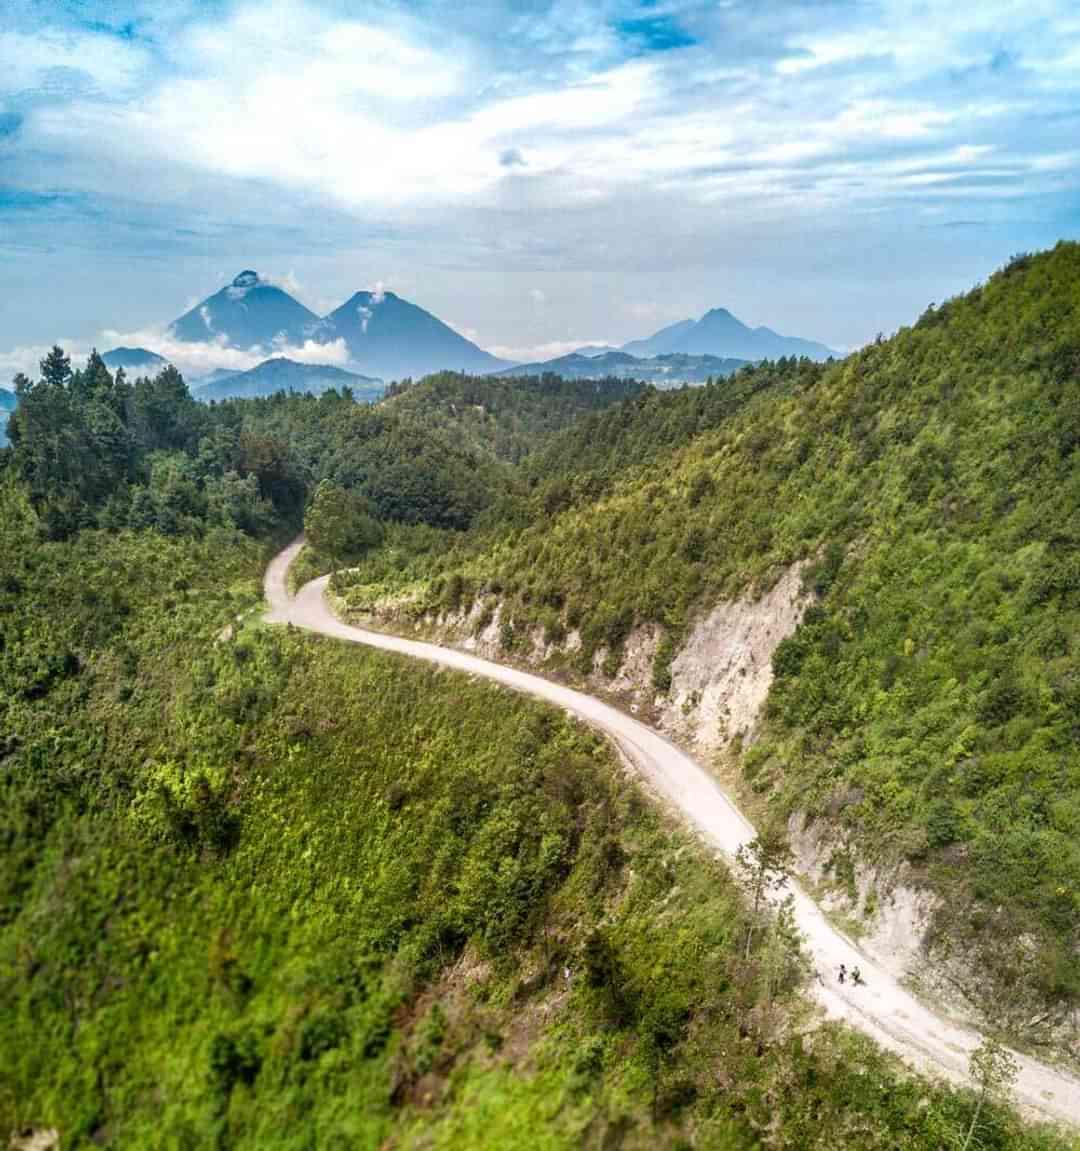 Mountain Biking tour in Guatemala riding singletrack through Volcanoes mountains